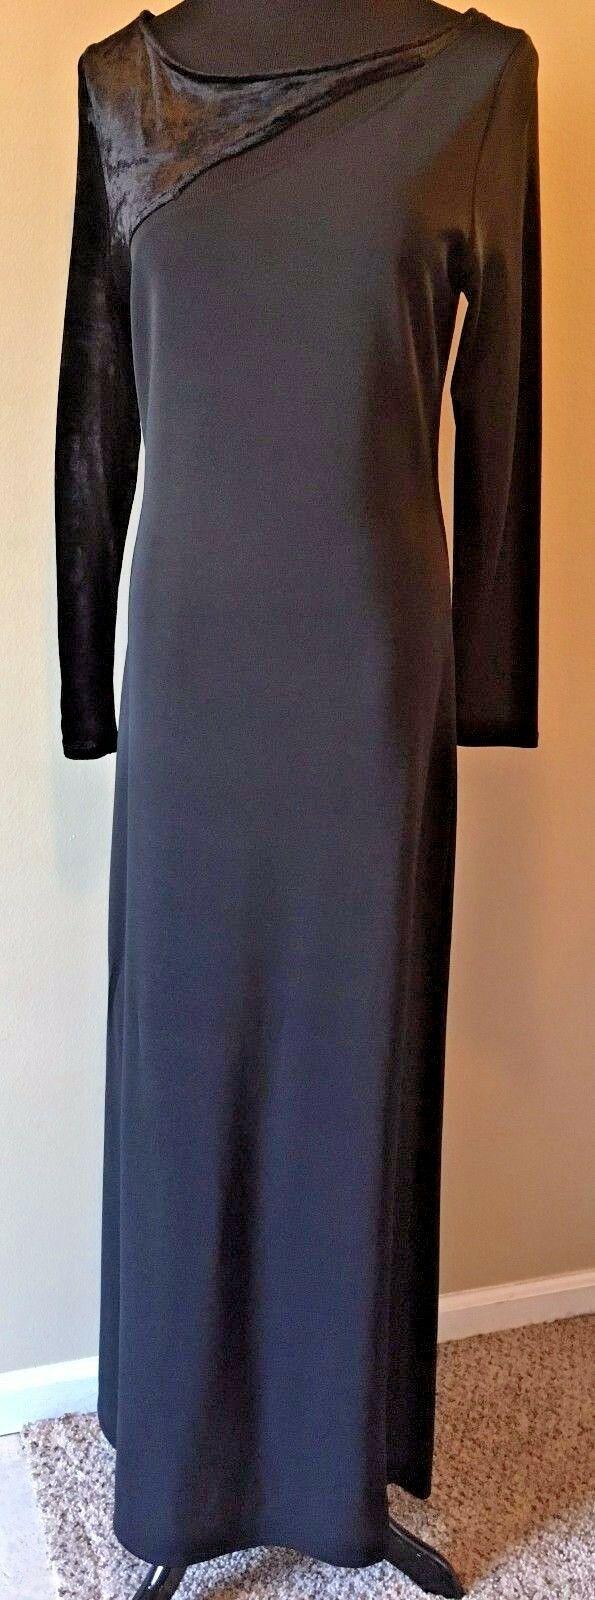 Anne Klein Black Velvet & Rayon Cutout Long Formal Dress size S M NWT $225 DS7